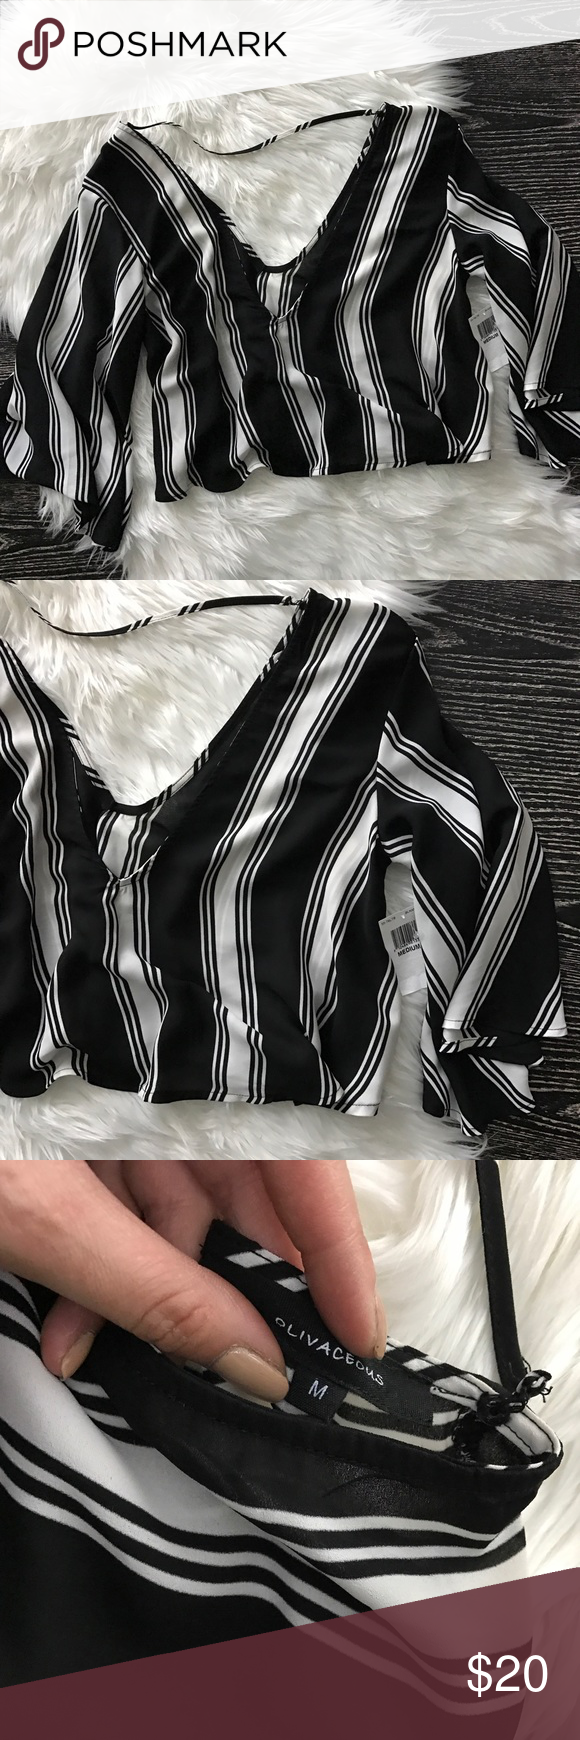 Olivaceous Black & White Crop Top Medium new with tags / olivaceous from nordstrom / black & white woven top / medium Nordstrom Tops Crop Tops